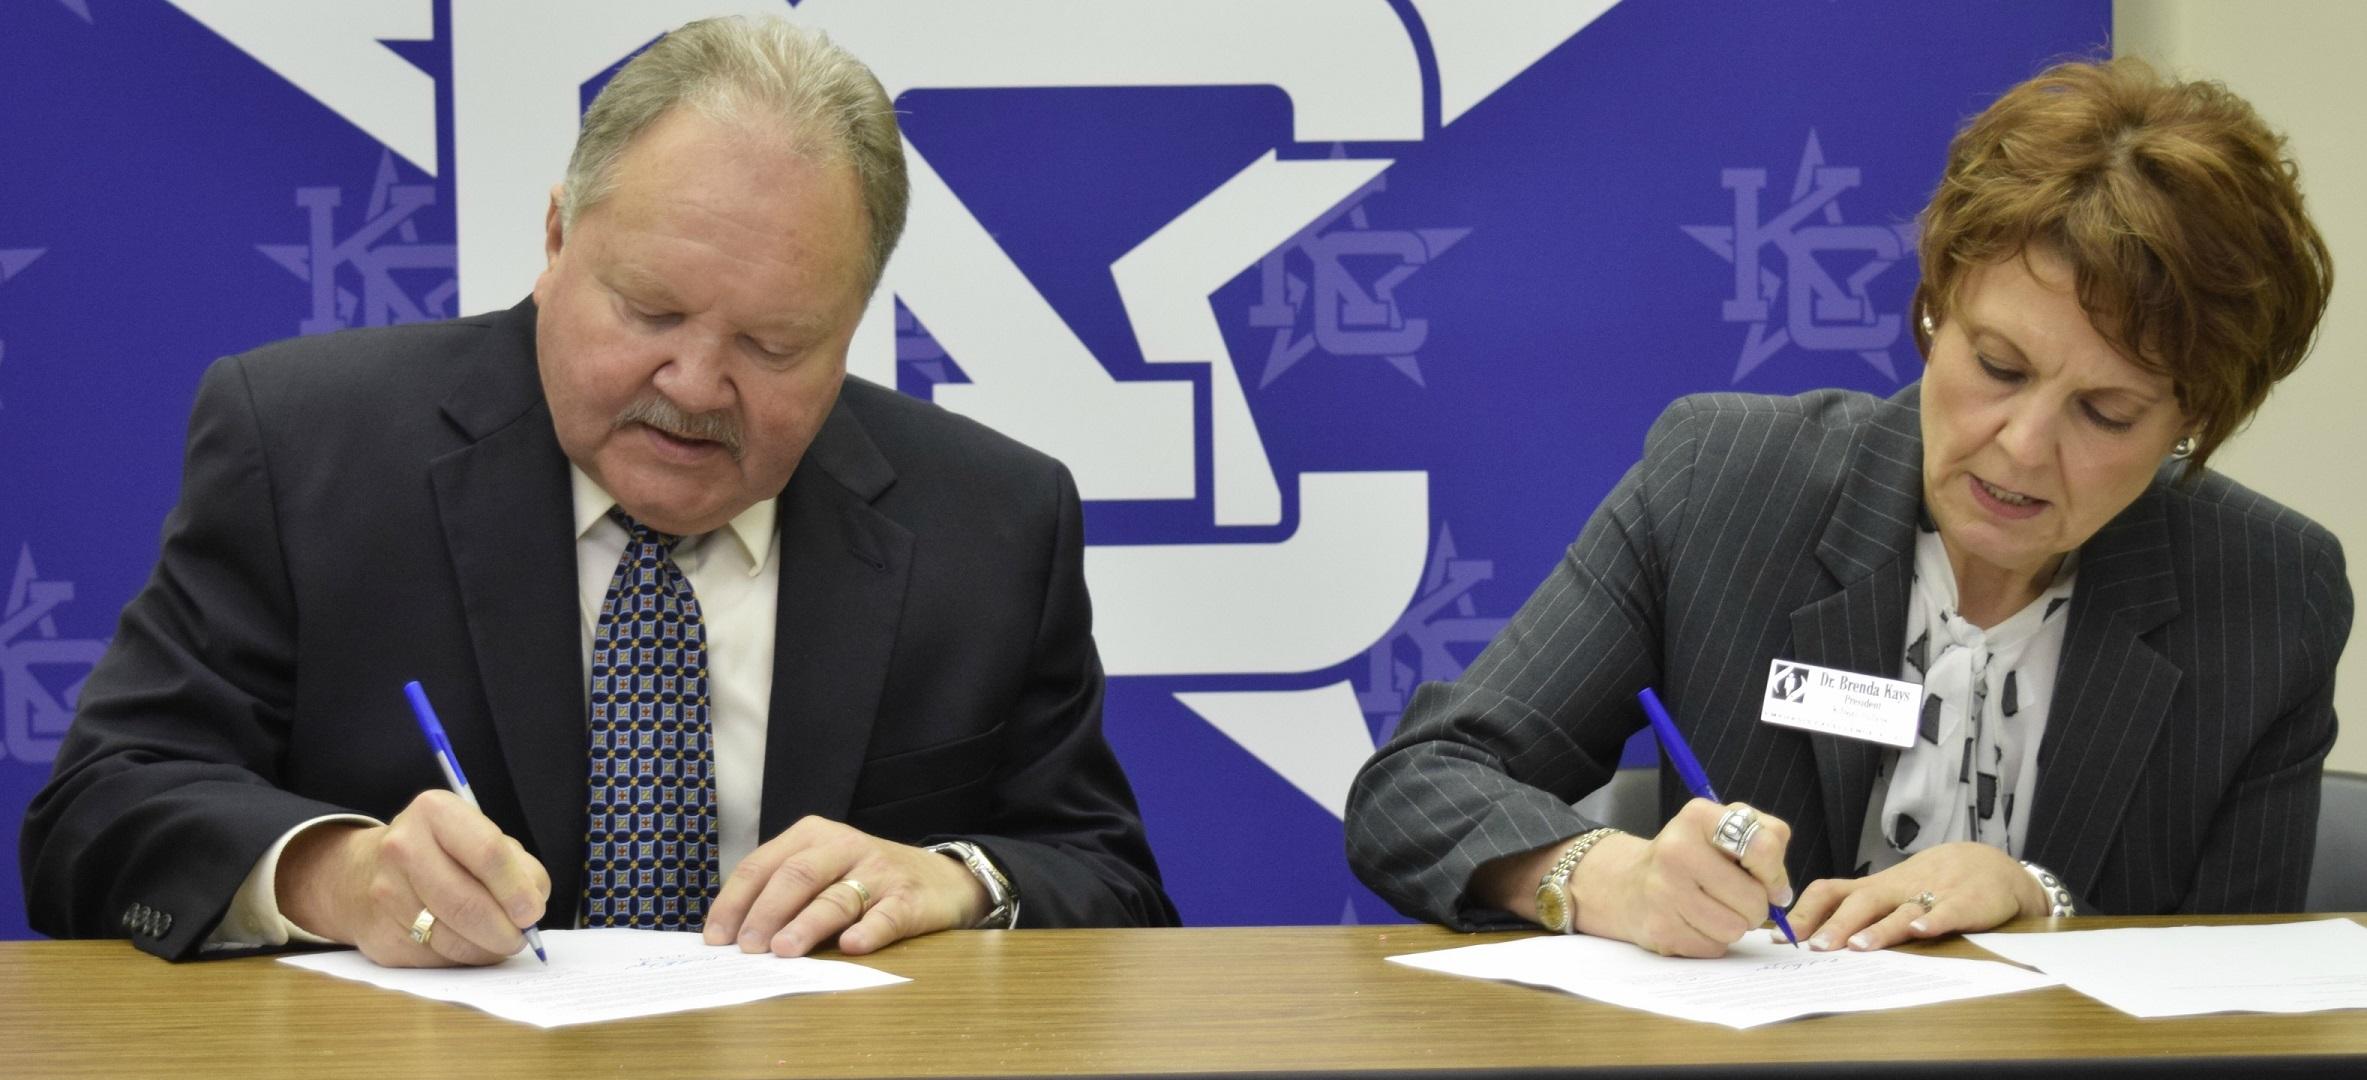 TSTC and Kilgore College Signal Continued Area Partnership